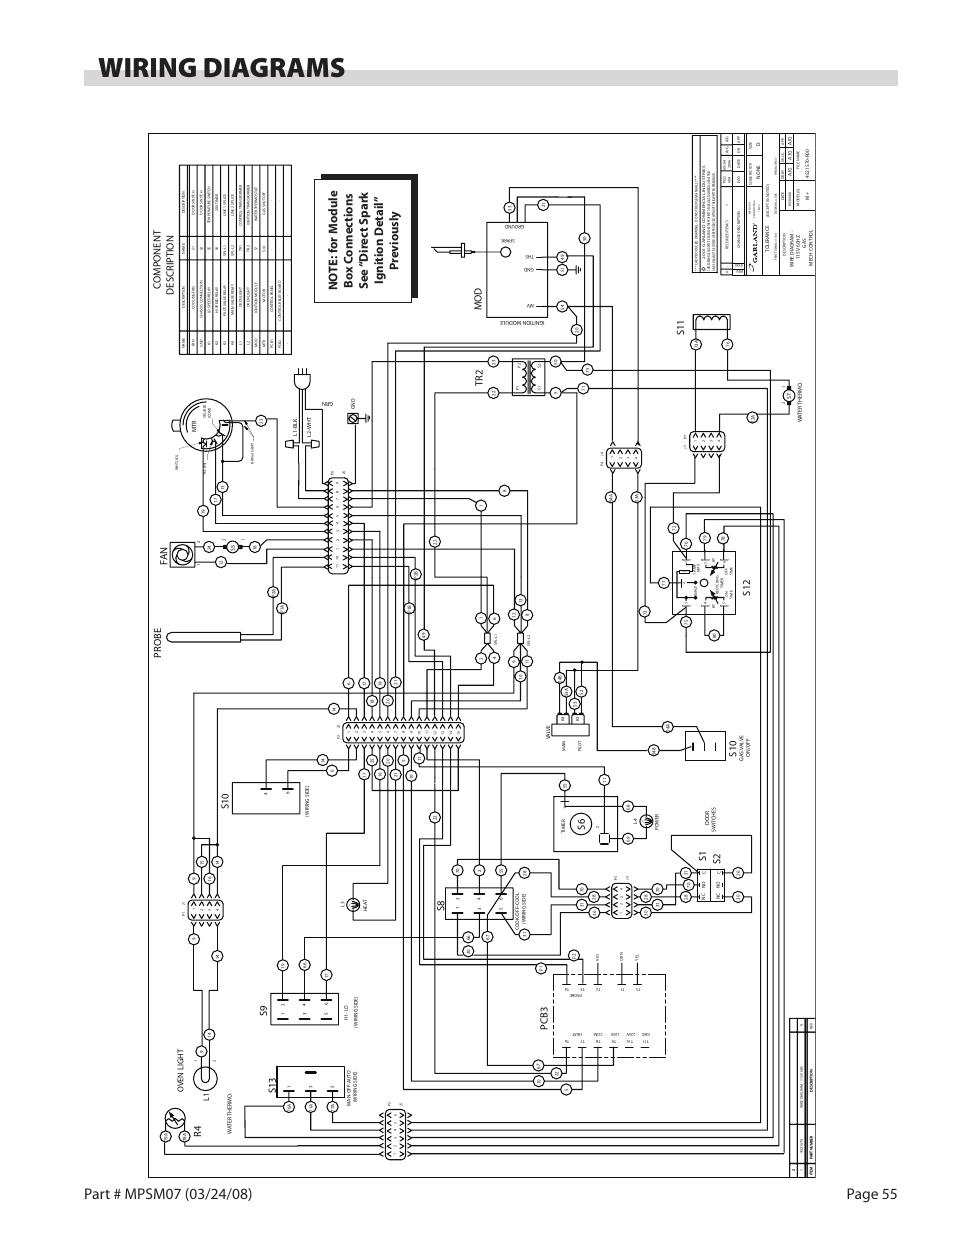 medium resolution of wiring diagrams s11 r4 fa n garland mp gd 10 s user manual residential electrical wiring diagrams garland wiring diagram